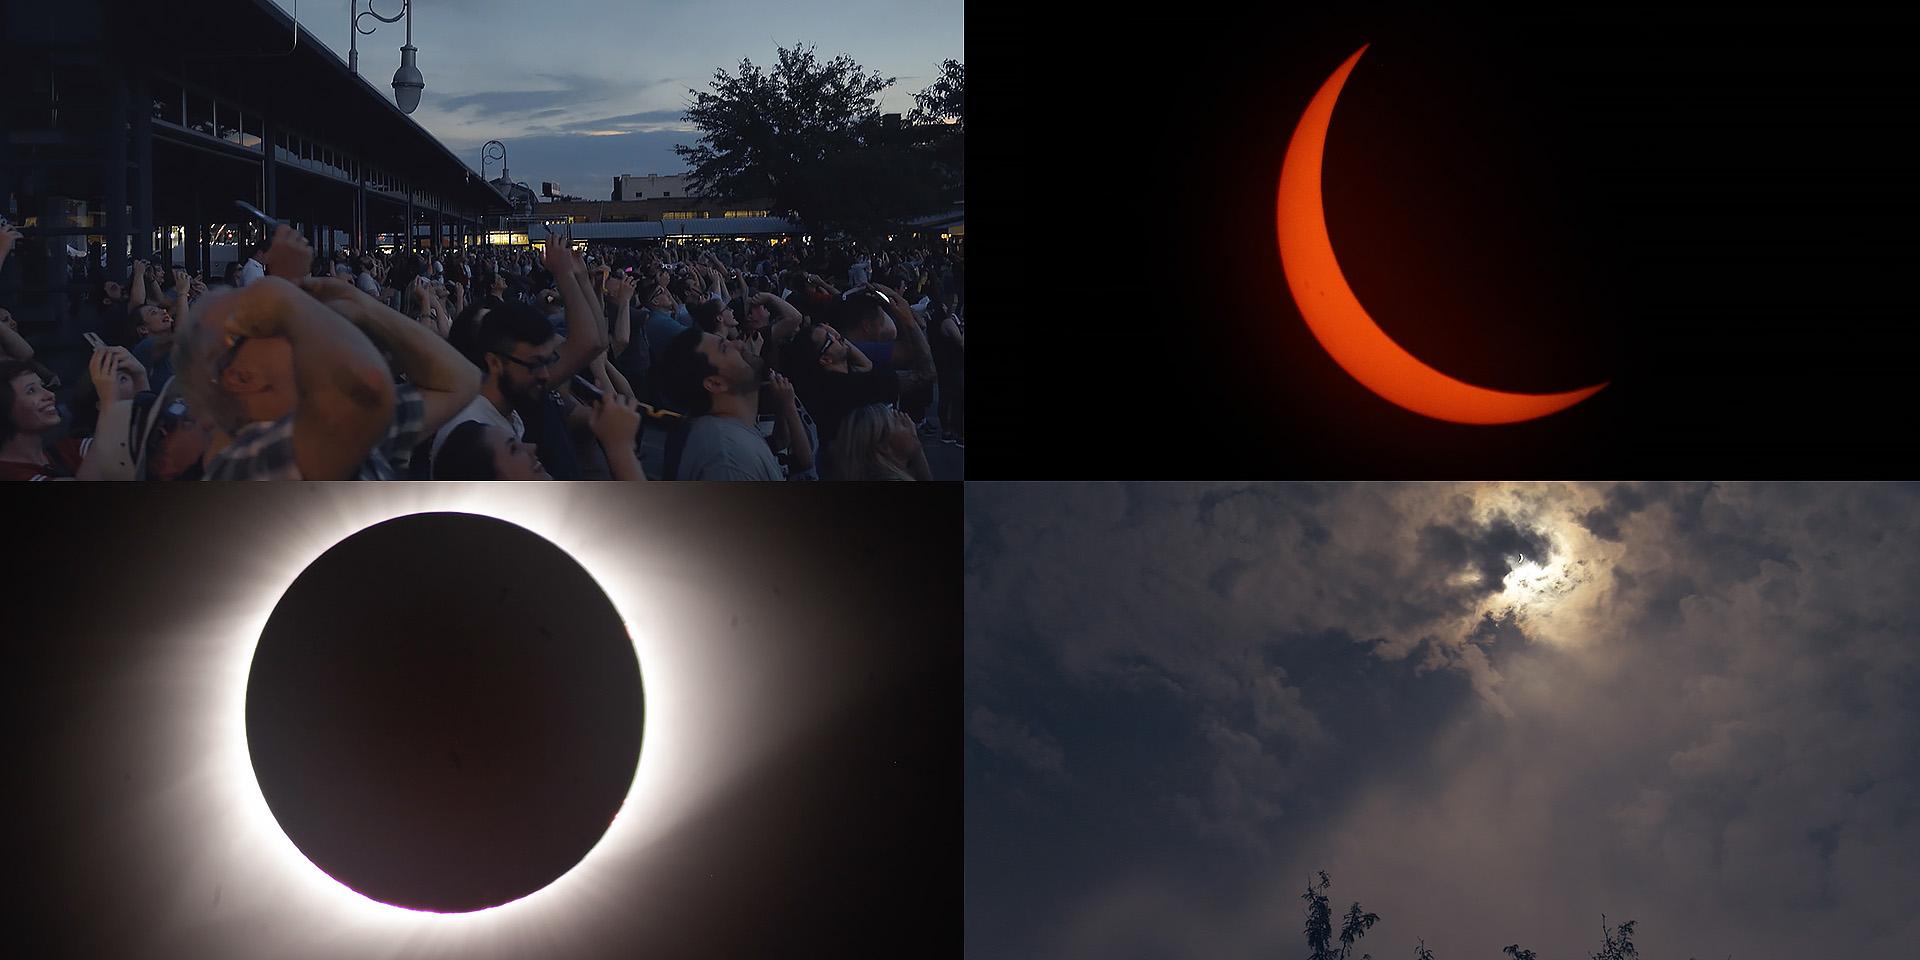 WAF_Eclipse2017_FilmStills_D1.jpg